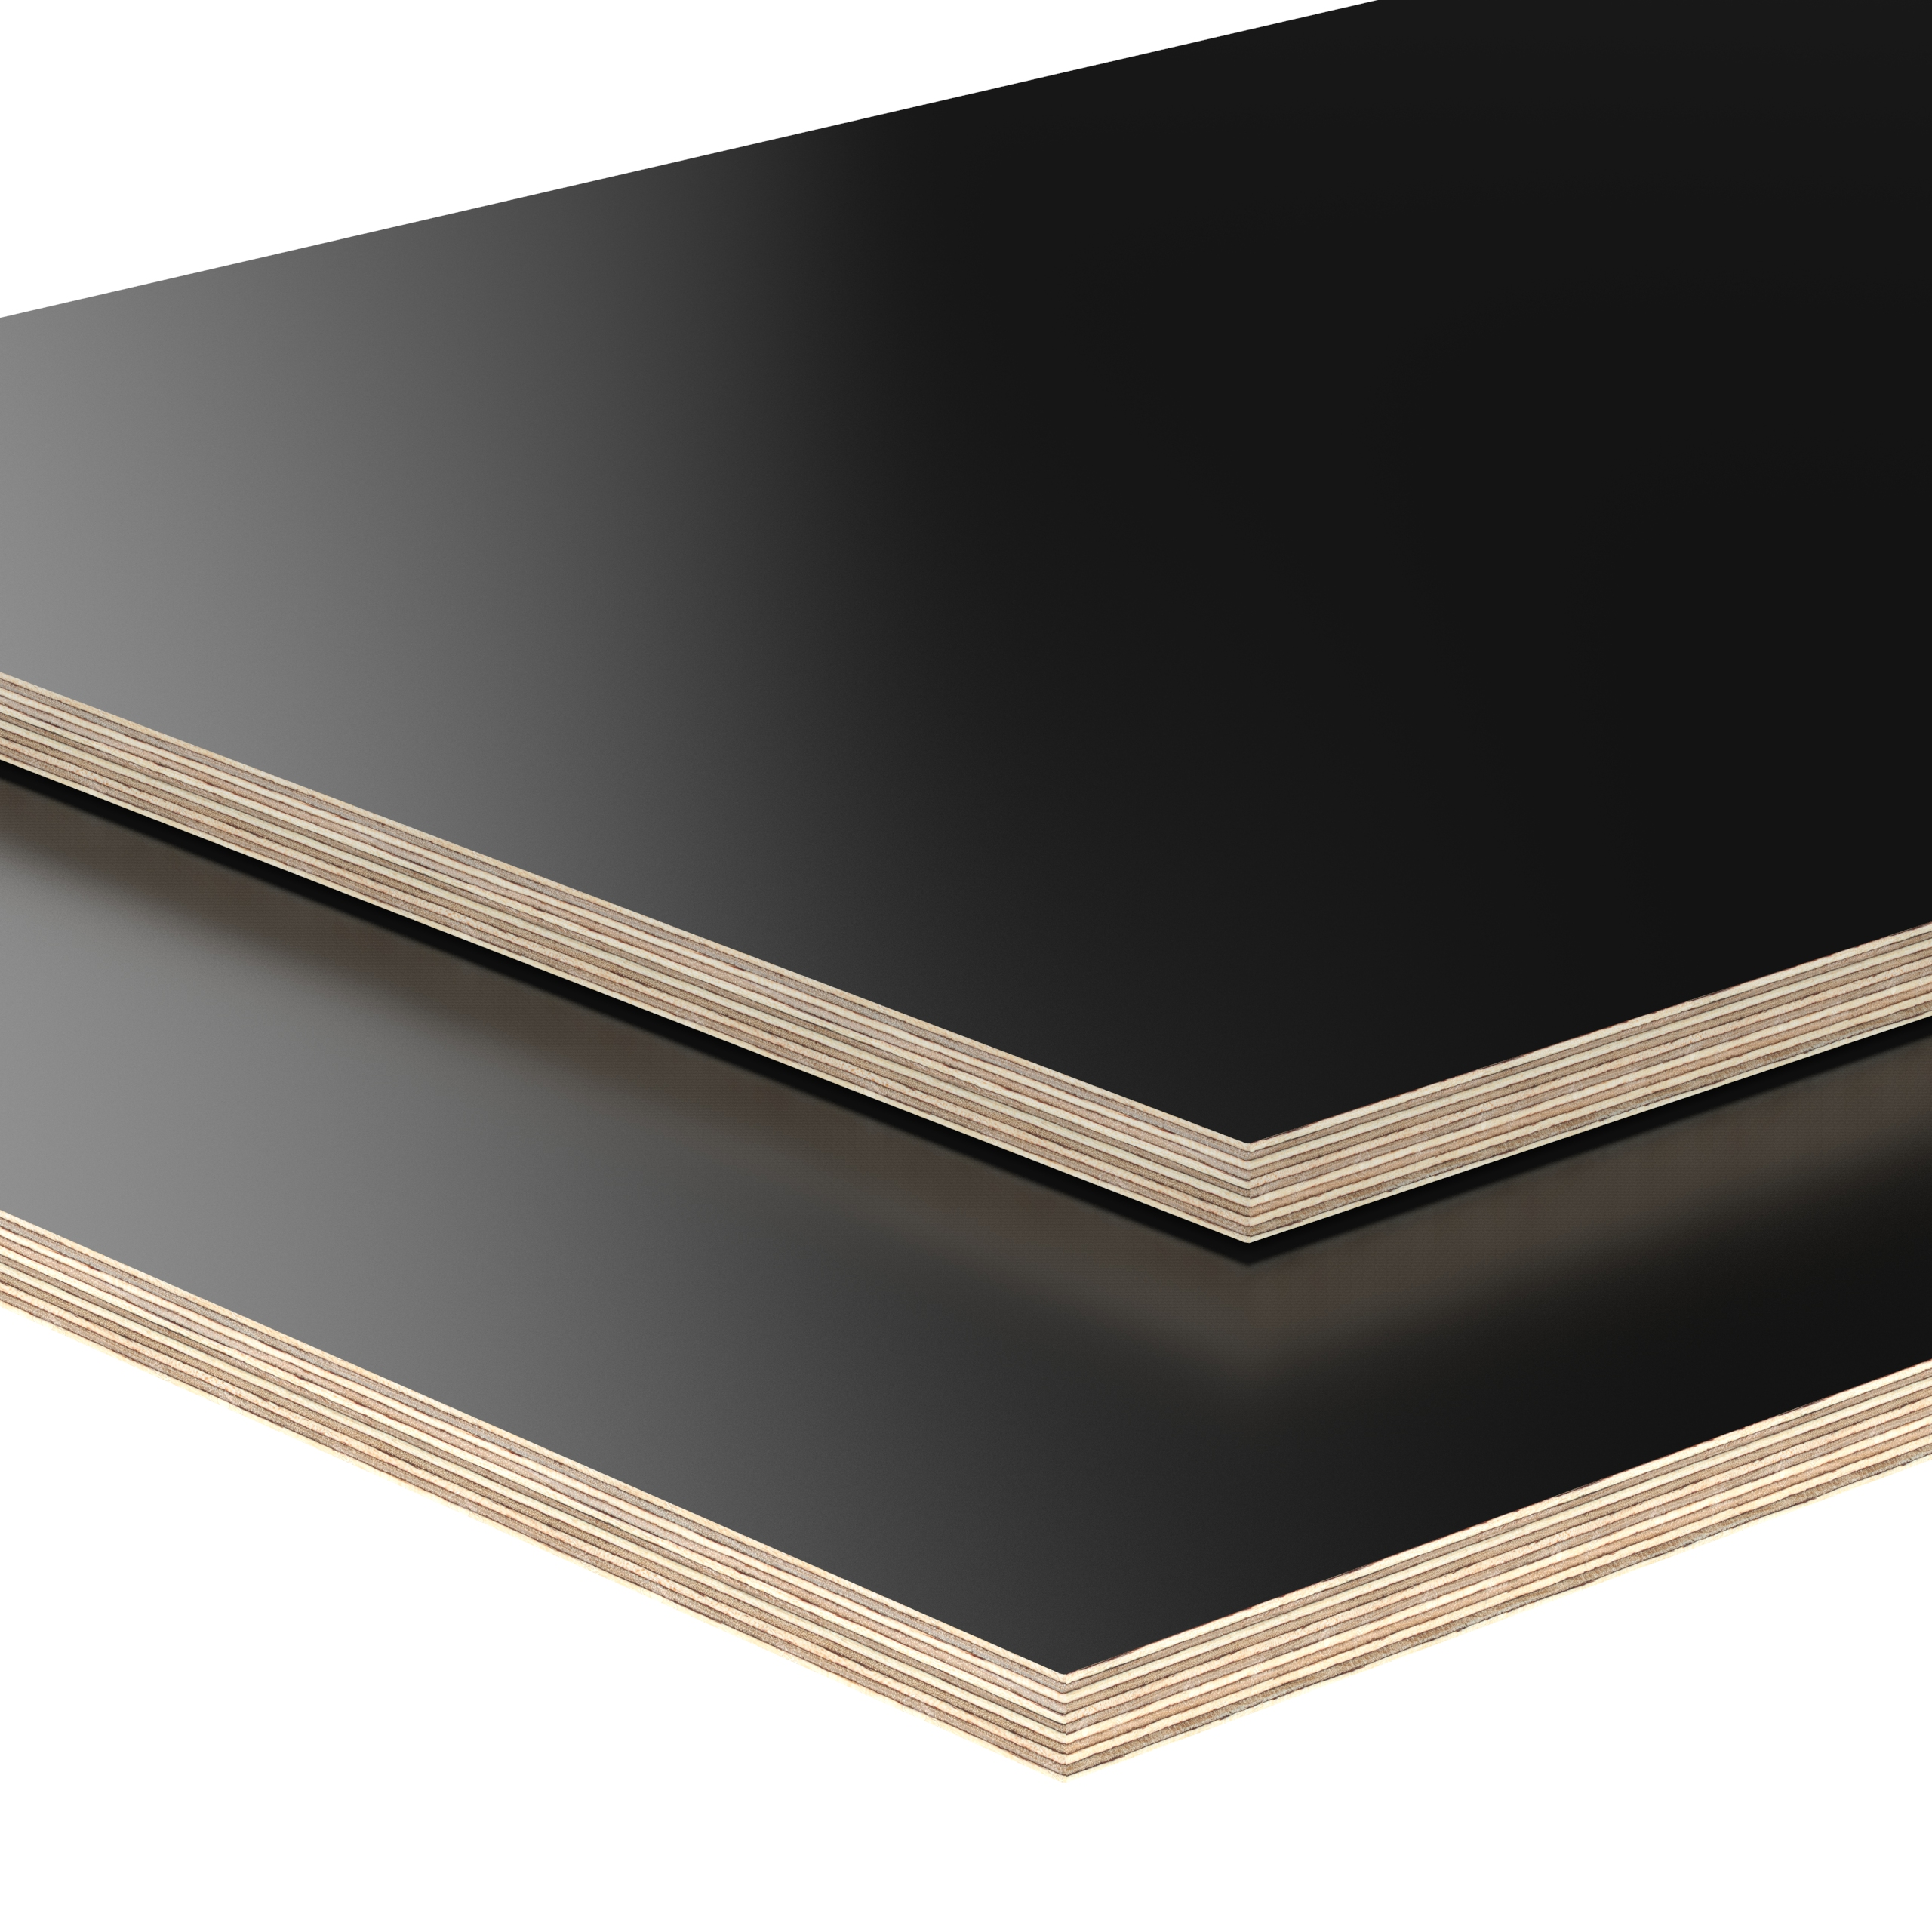 50x50 cm 12mm Multiplex Zuschnitt wei/ß melaminbeschichtet L/änge bis 200cm Multiplexplatten Zuschnitte Auswahl